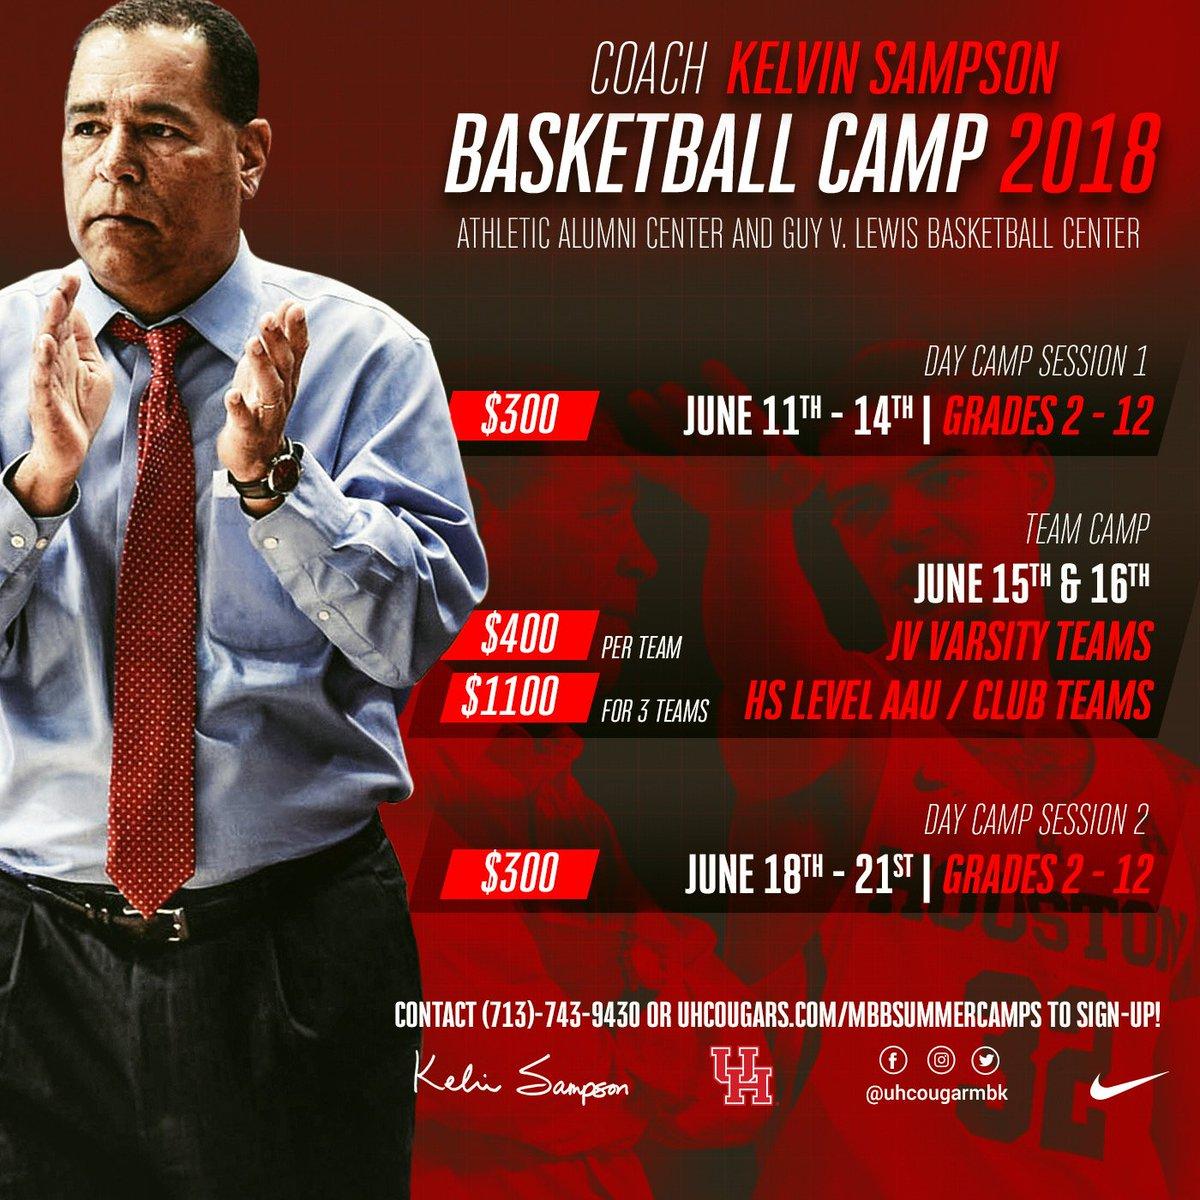 2018 Houston summer camps2018 Houston camps Houston